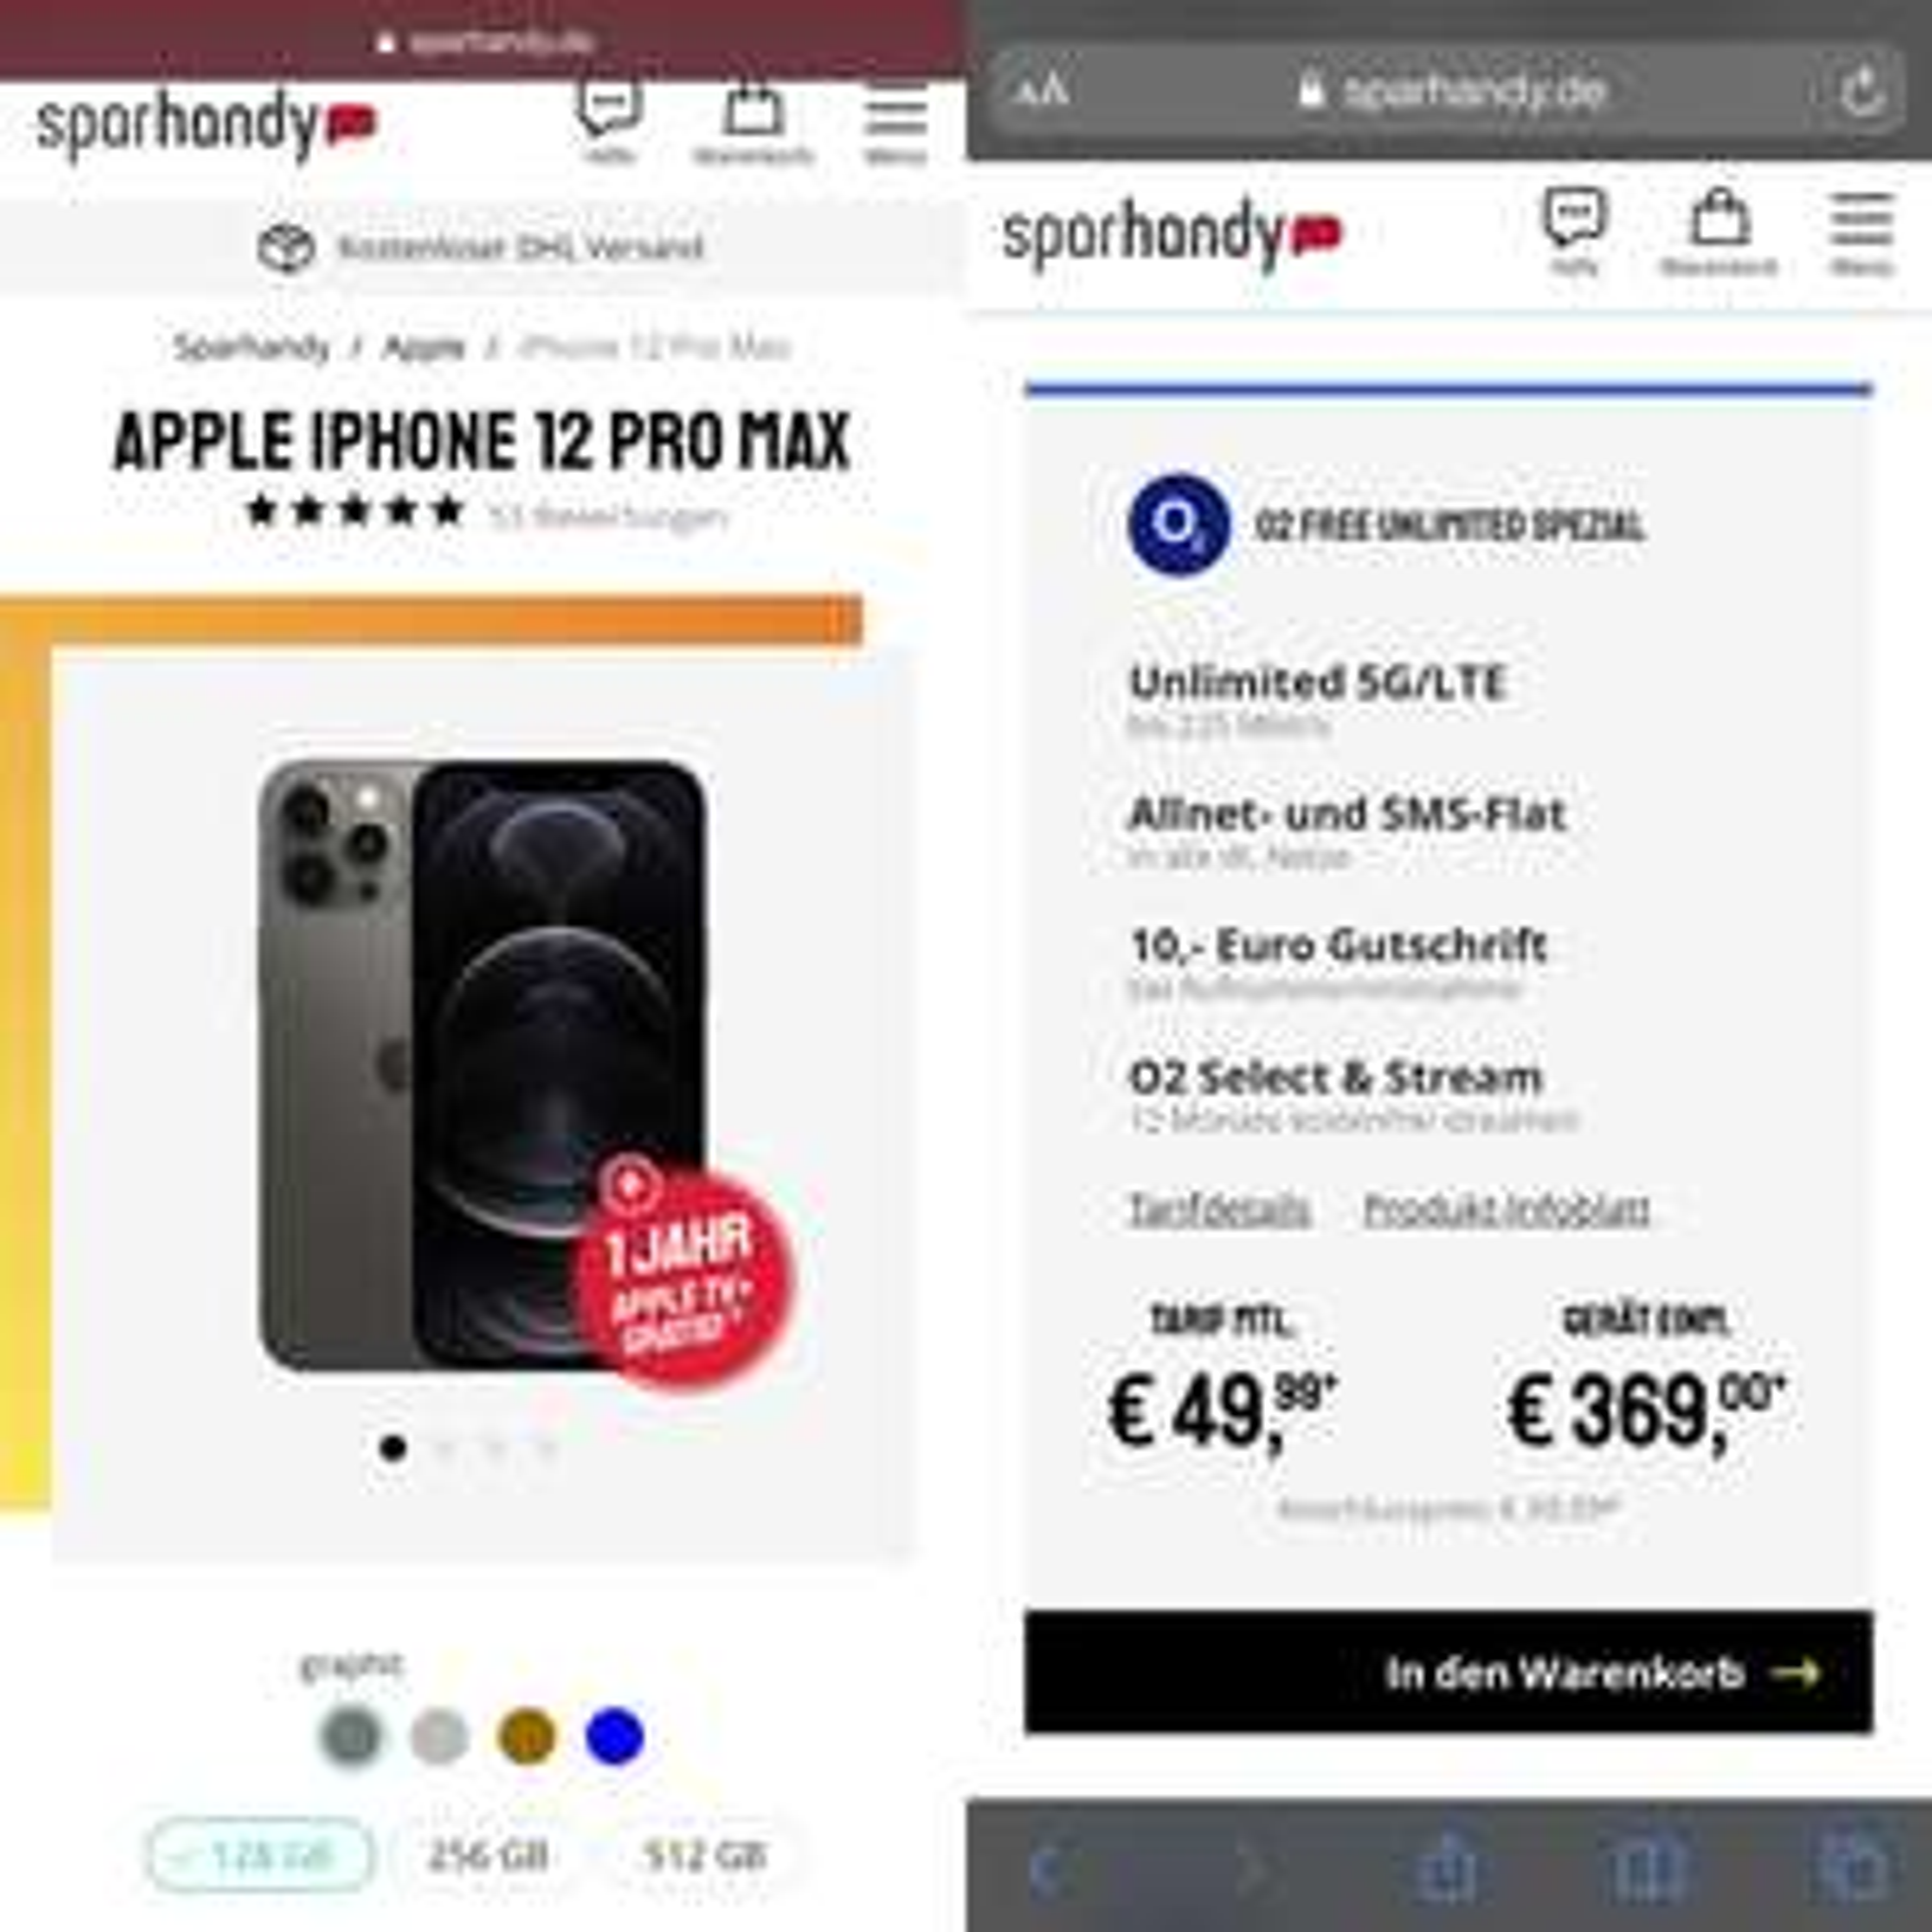 Apple iPhone 12 Pro Max 128GB mit O2 Free Unlimited (unbegrenztes Datenvolumen inkl. 5G, Allnet/SMS) mtl. 49,99€ einm. 369€, 39,99€ AG